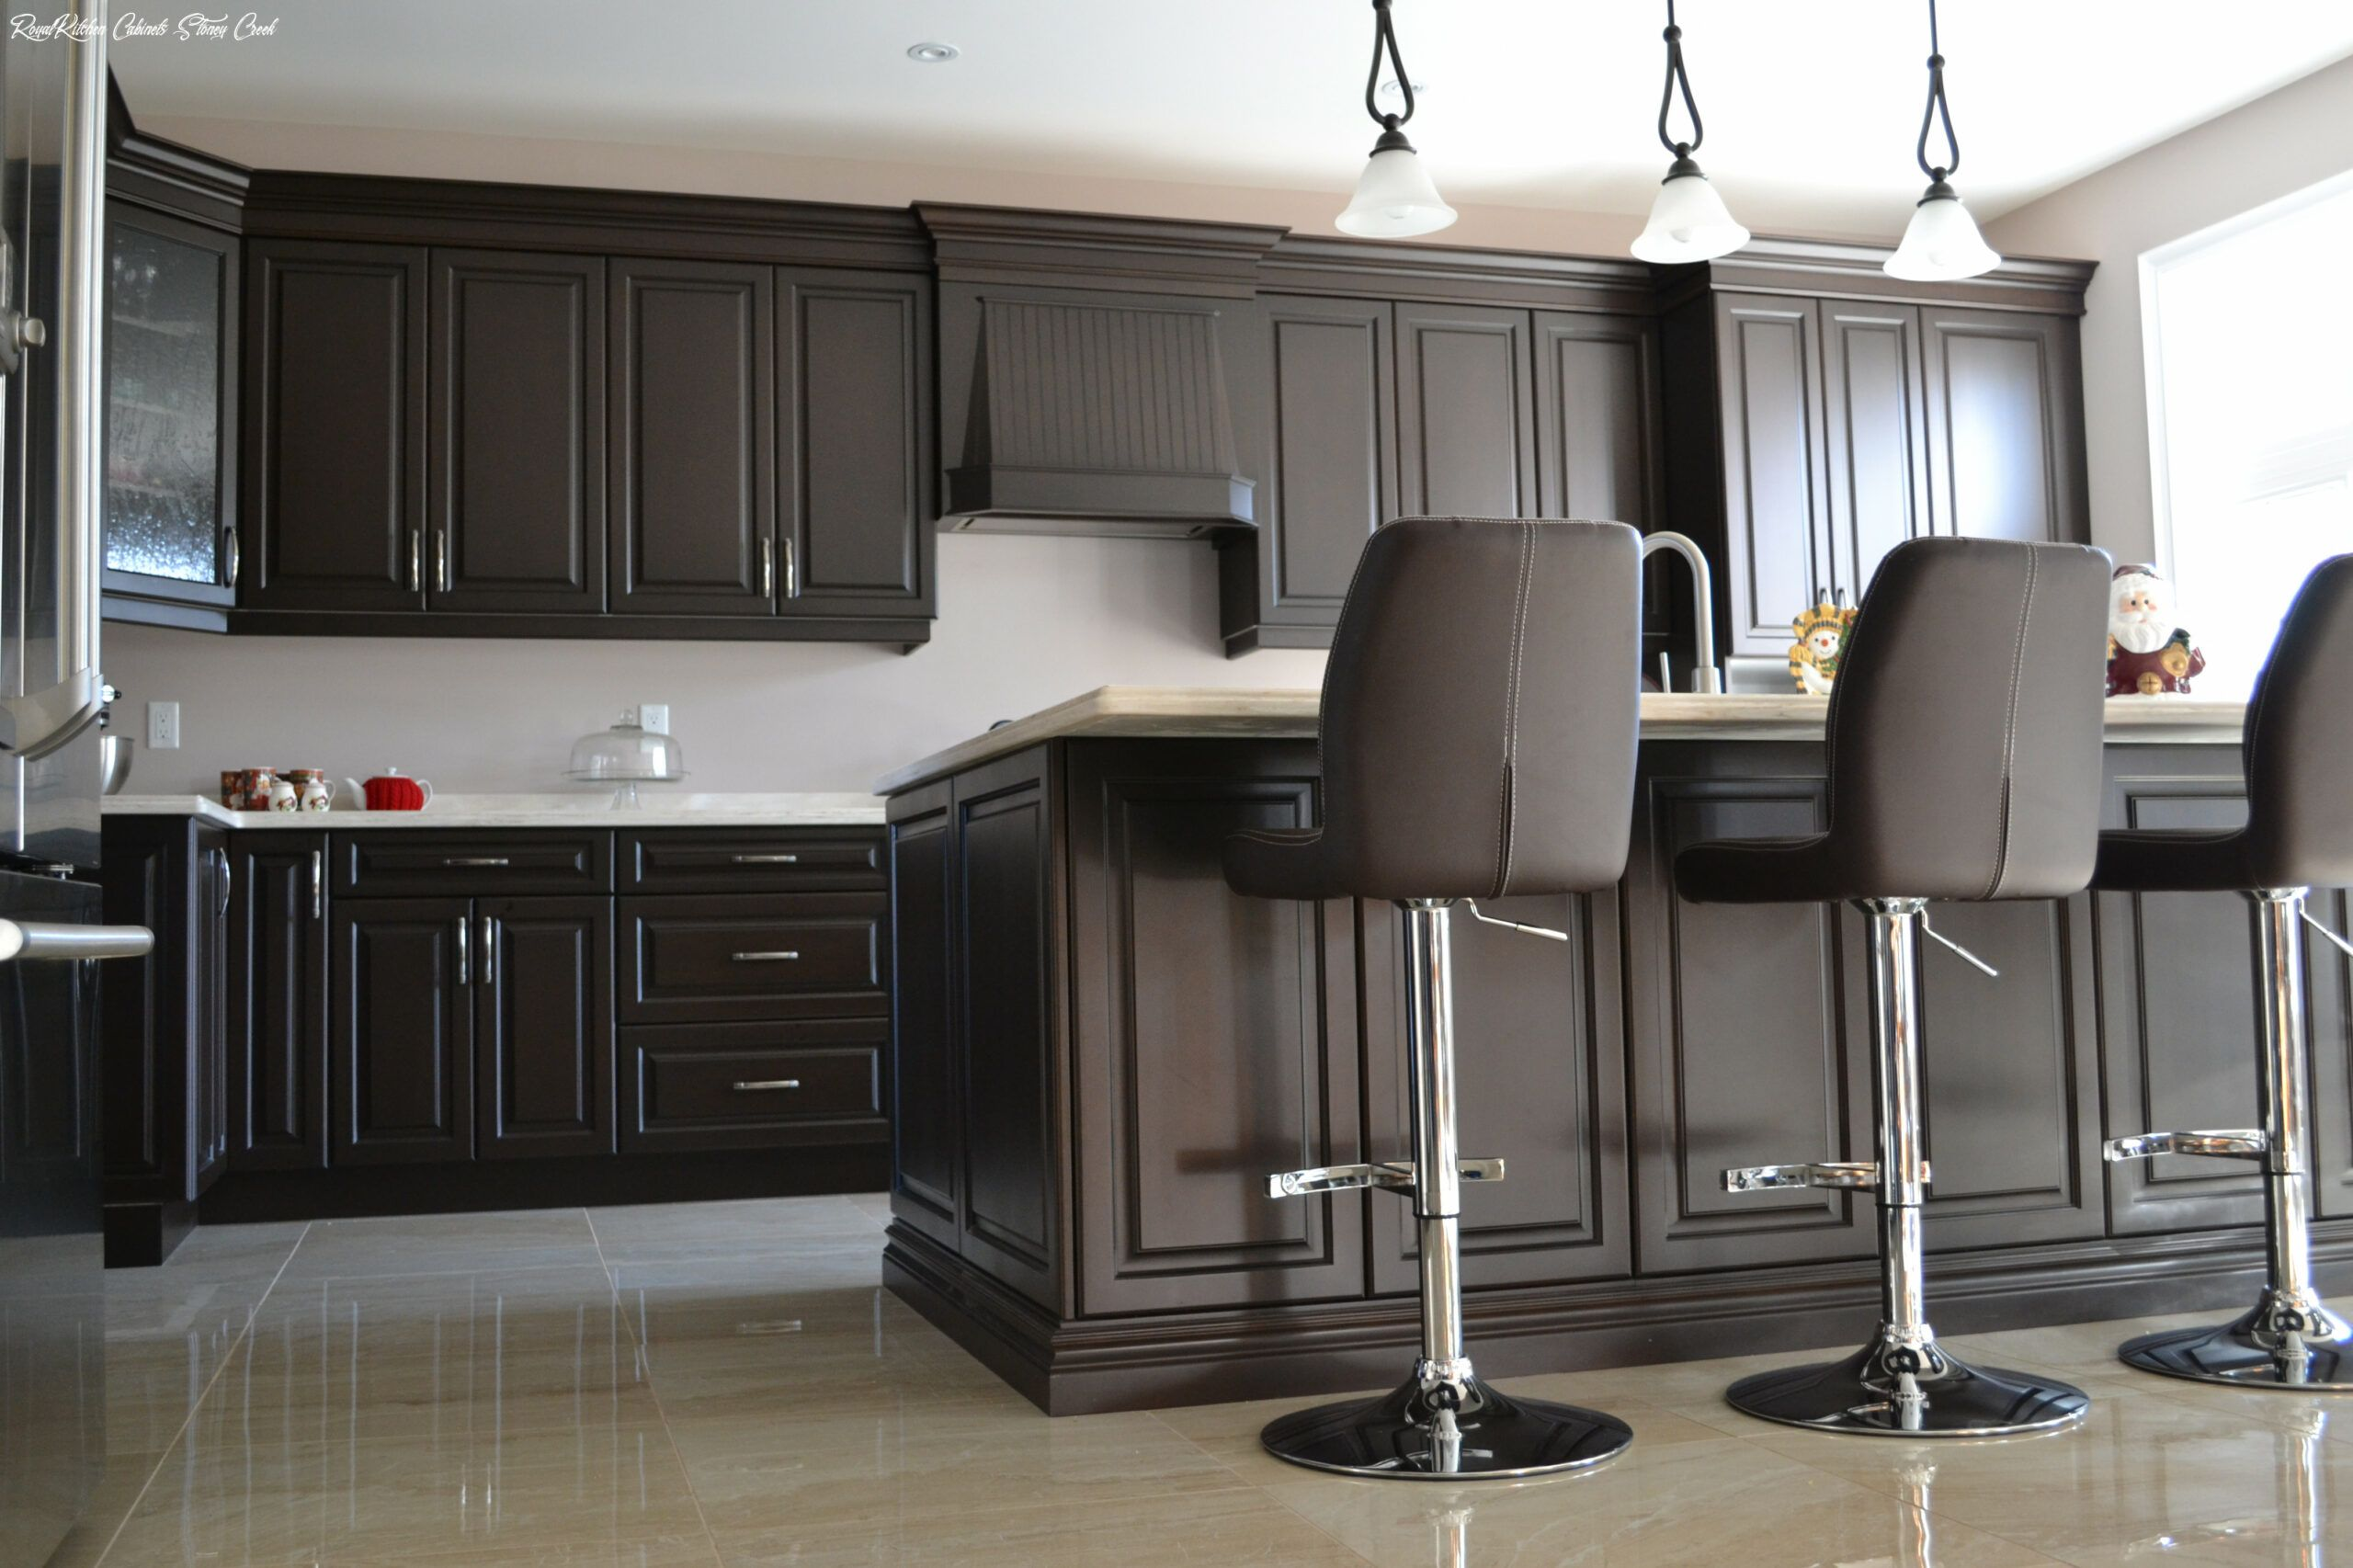 Royal Kitchen Cabinets Stoney Creek In 2020 Kitchen Design Kitchen Cabinets Kitchen